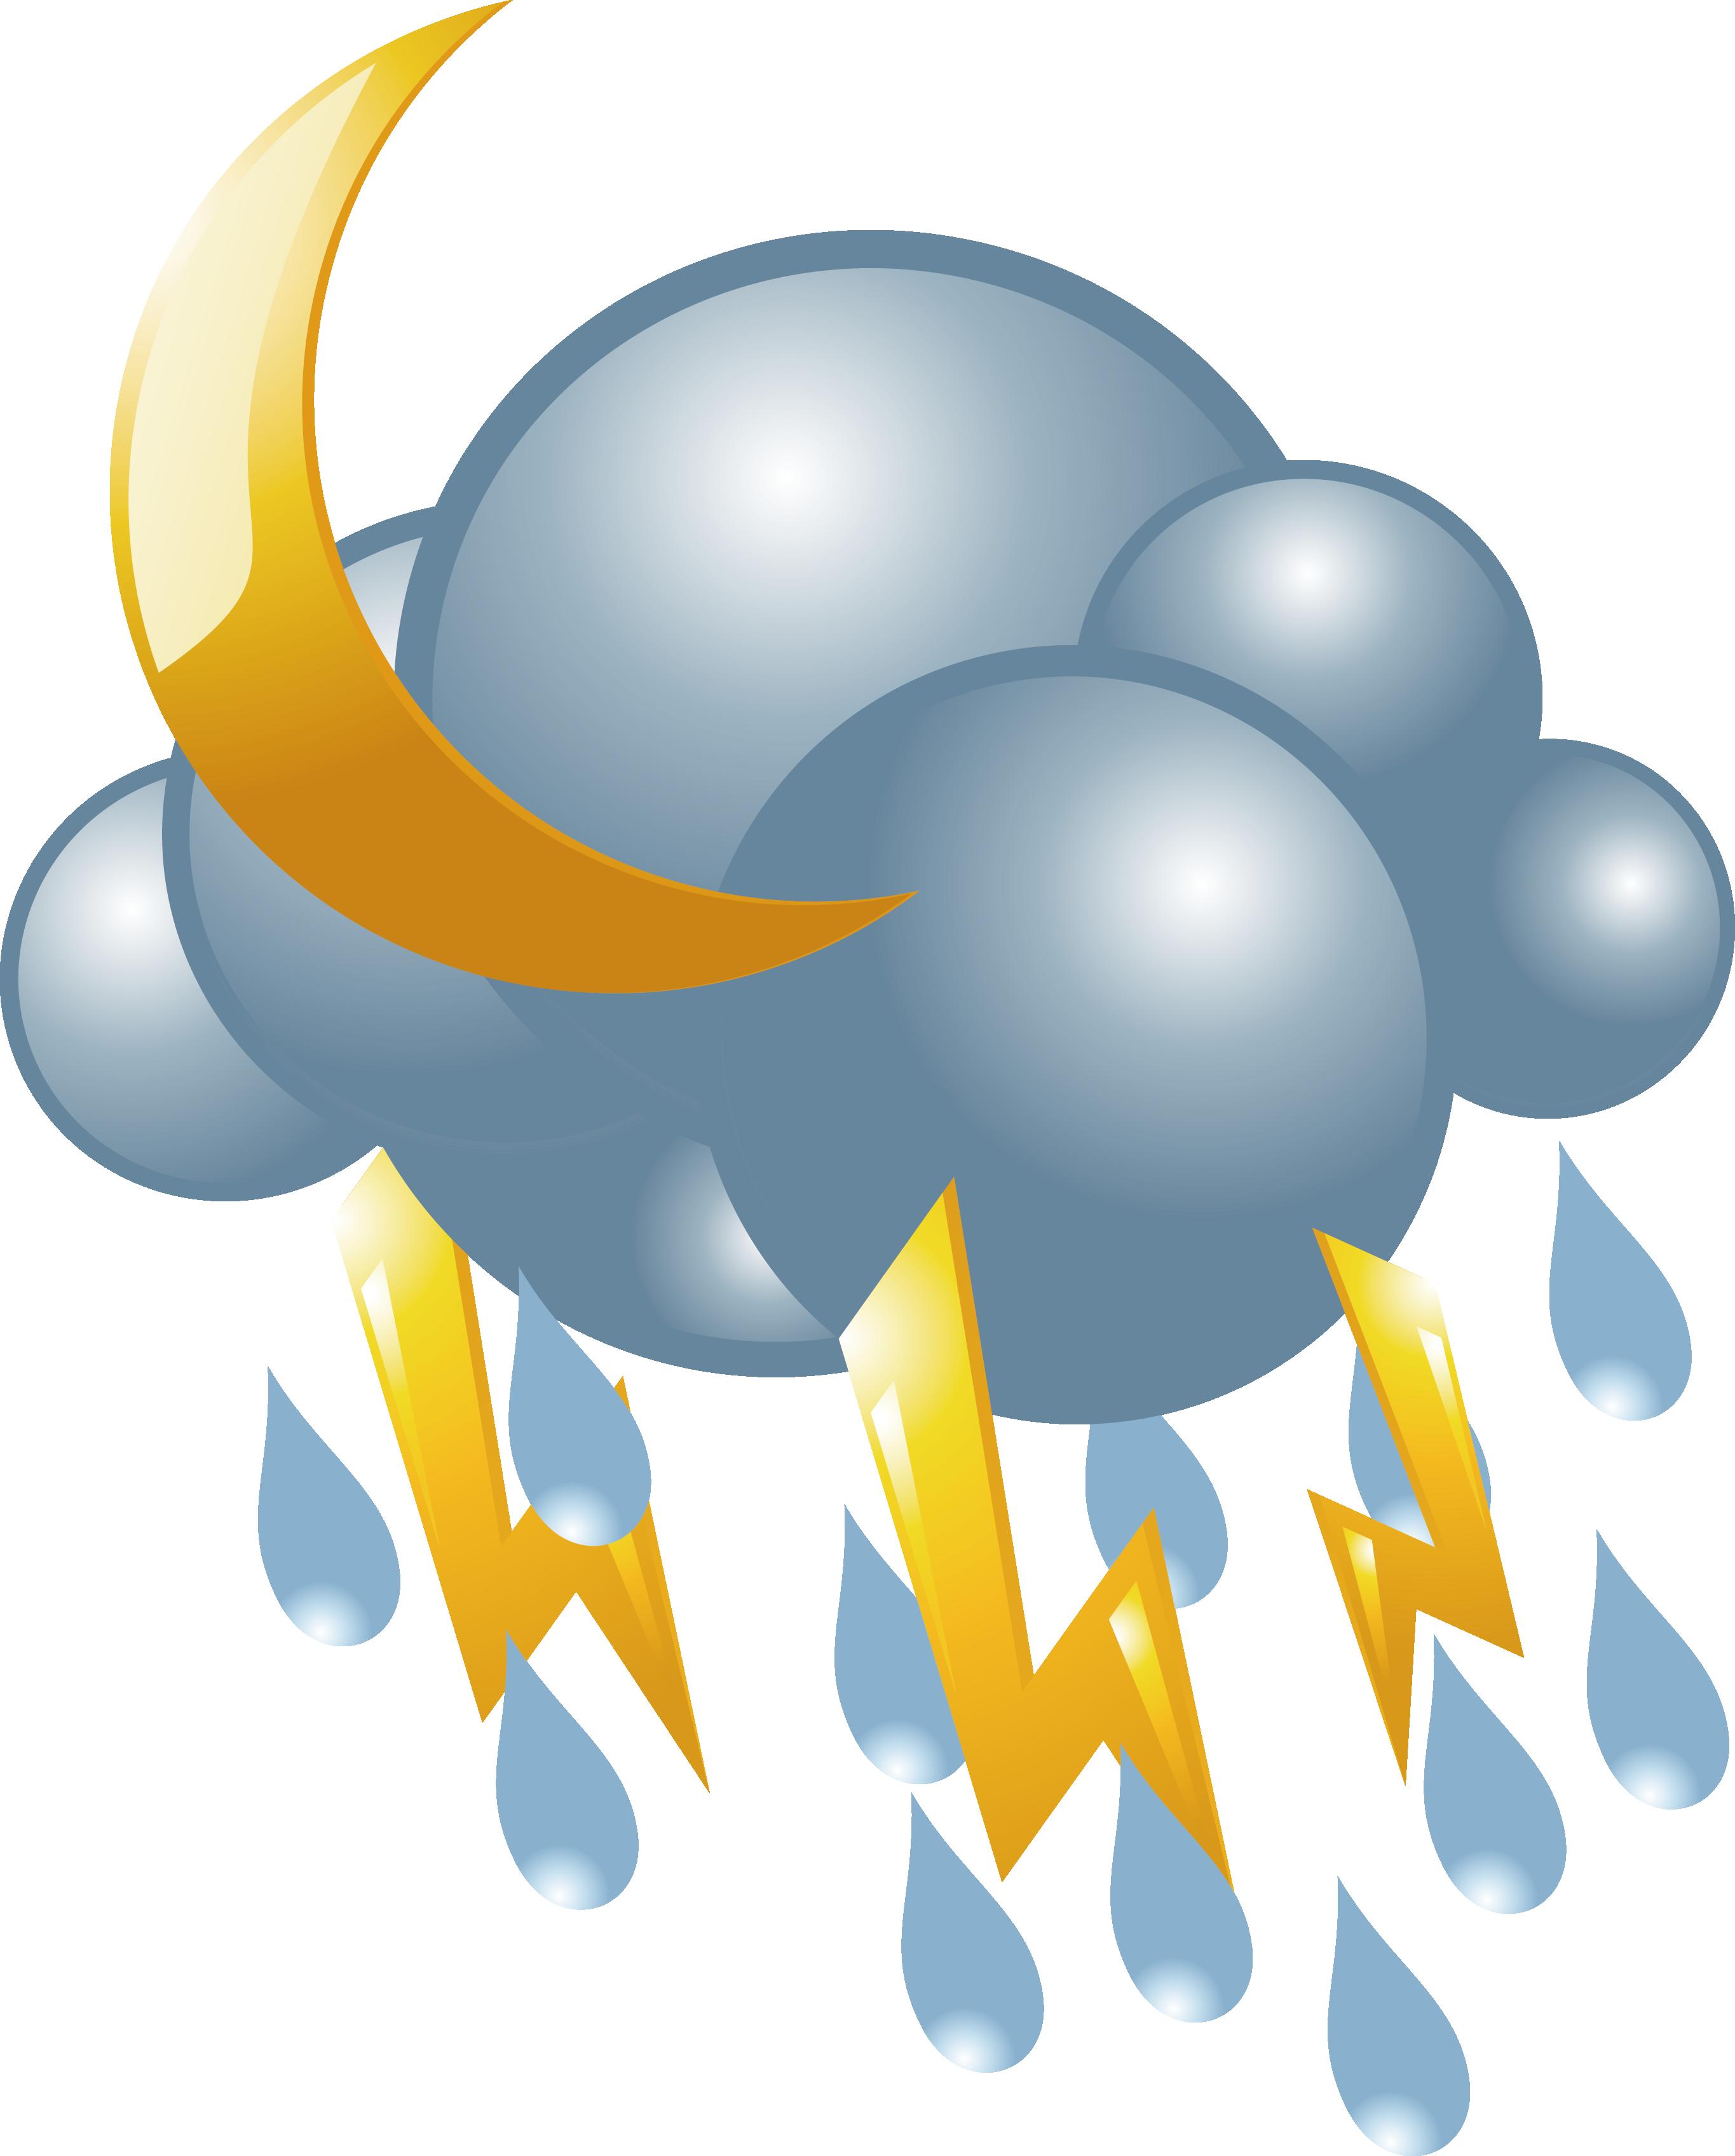 Lightning cloud icon vector. Clipart rain snow mix